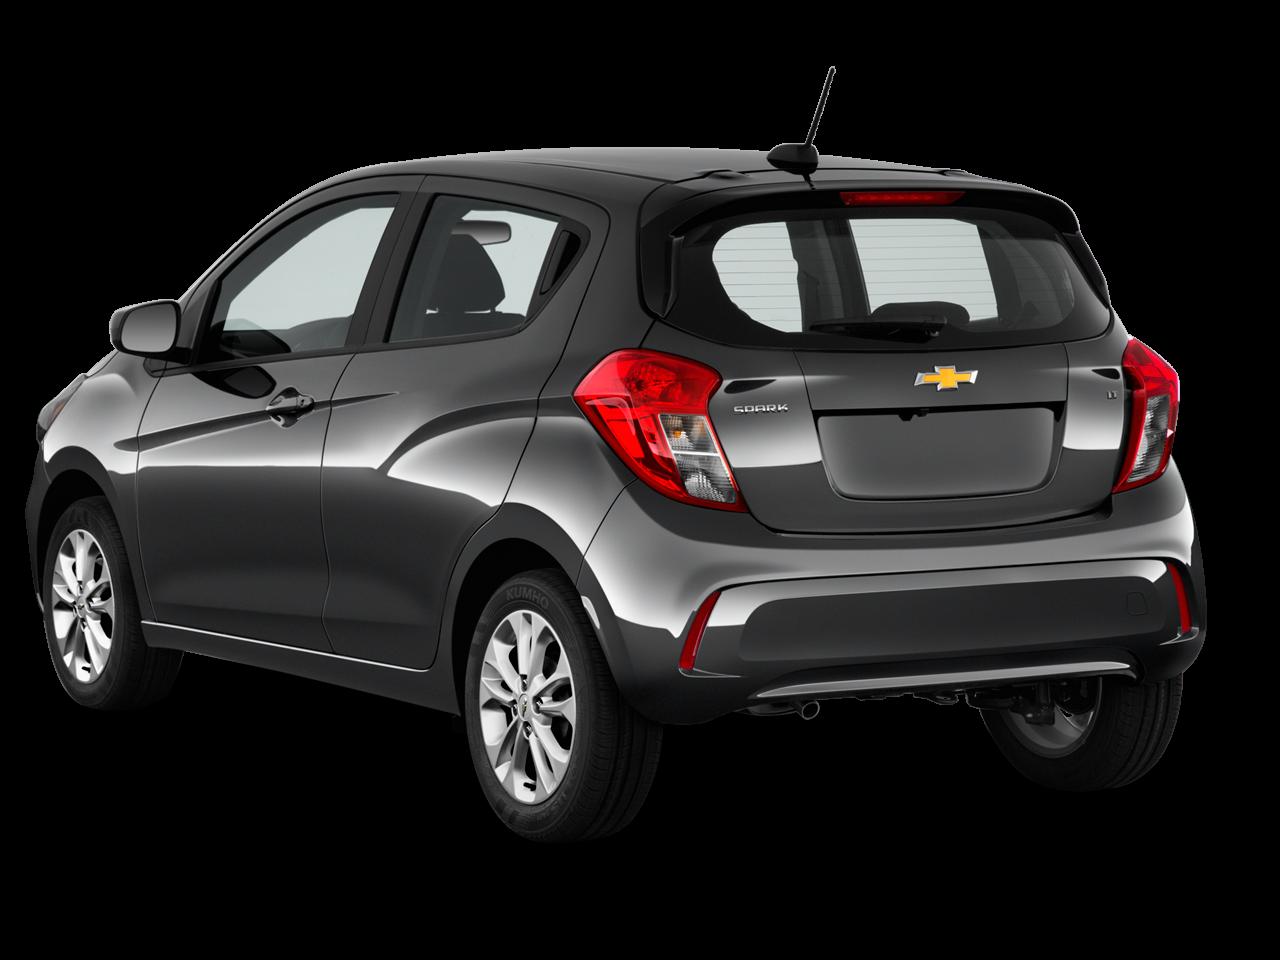 Kekurangan Spark Chevrolet 2019 Perbandingan Harga